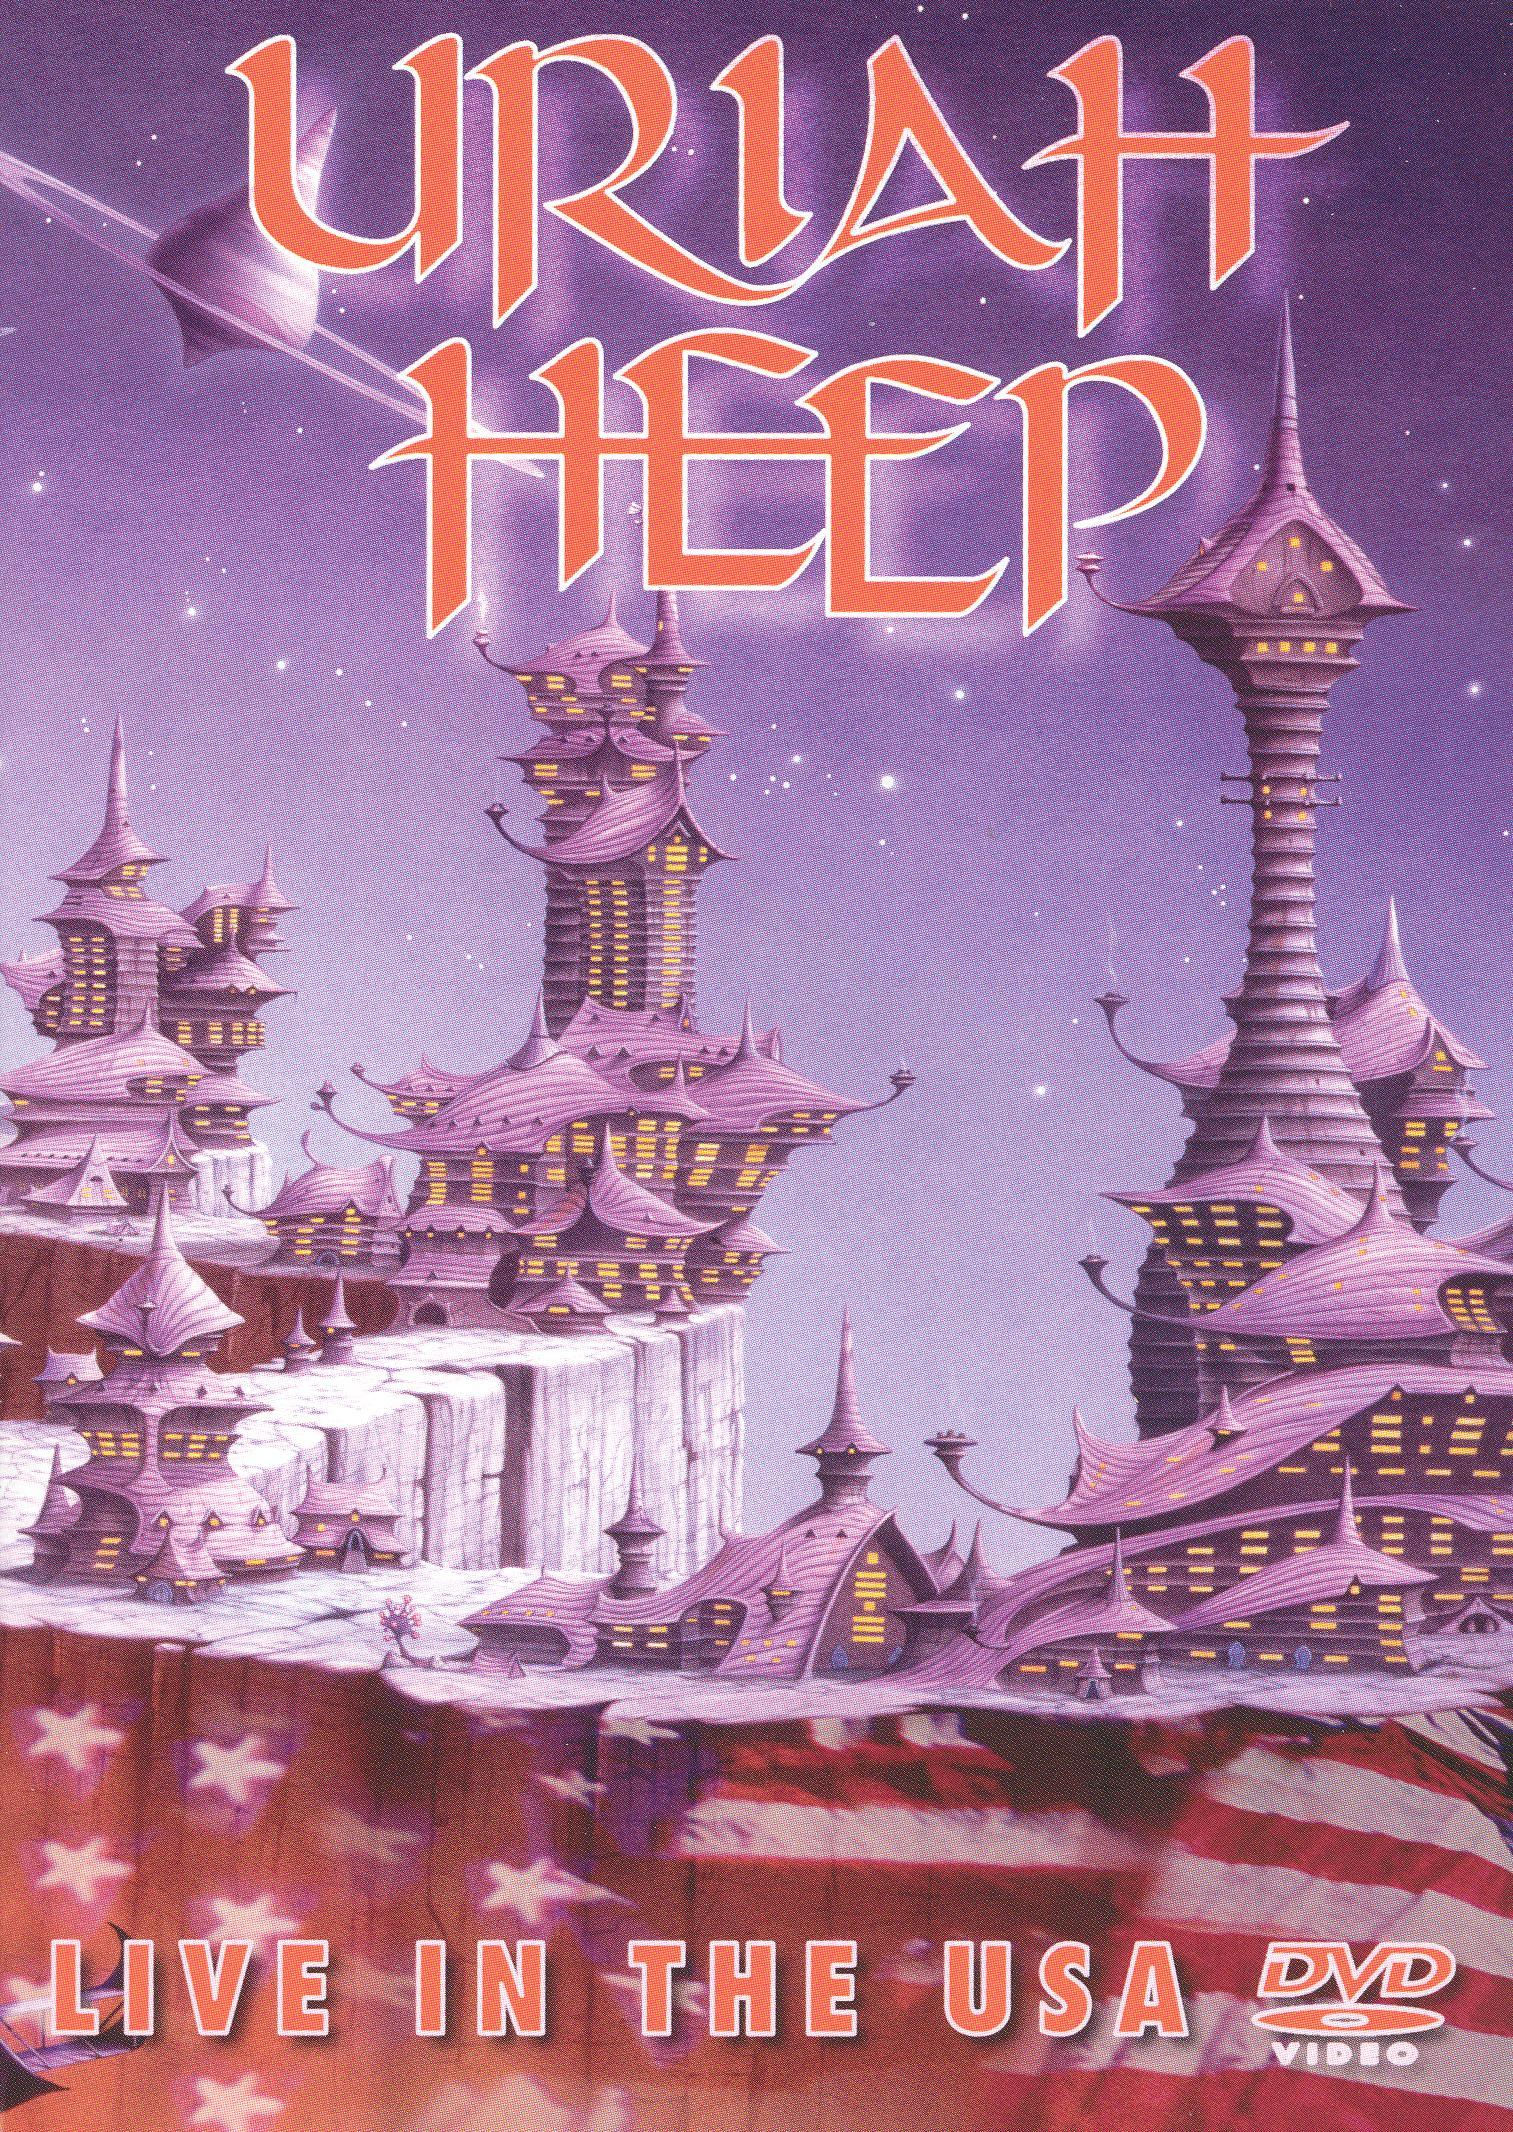 Uriah Heep: Live in the USA